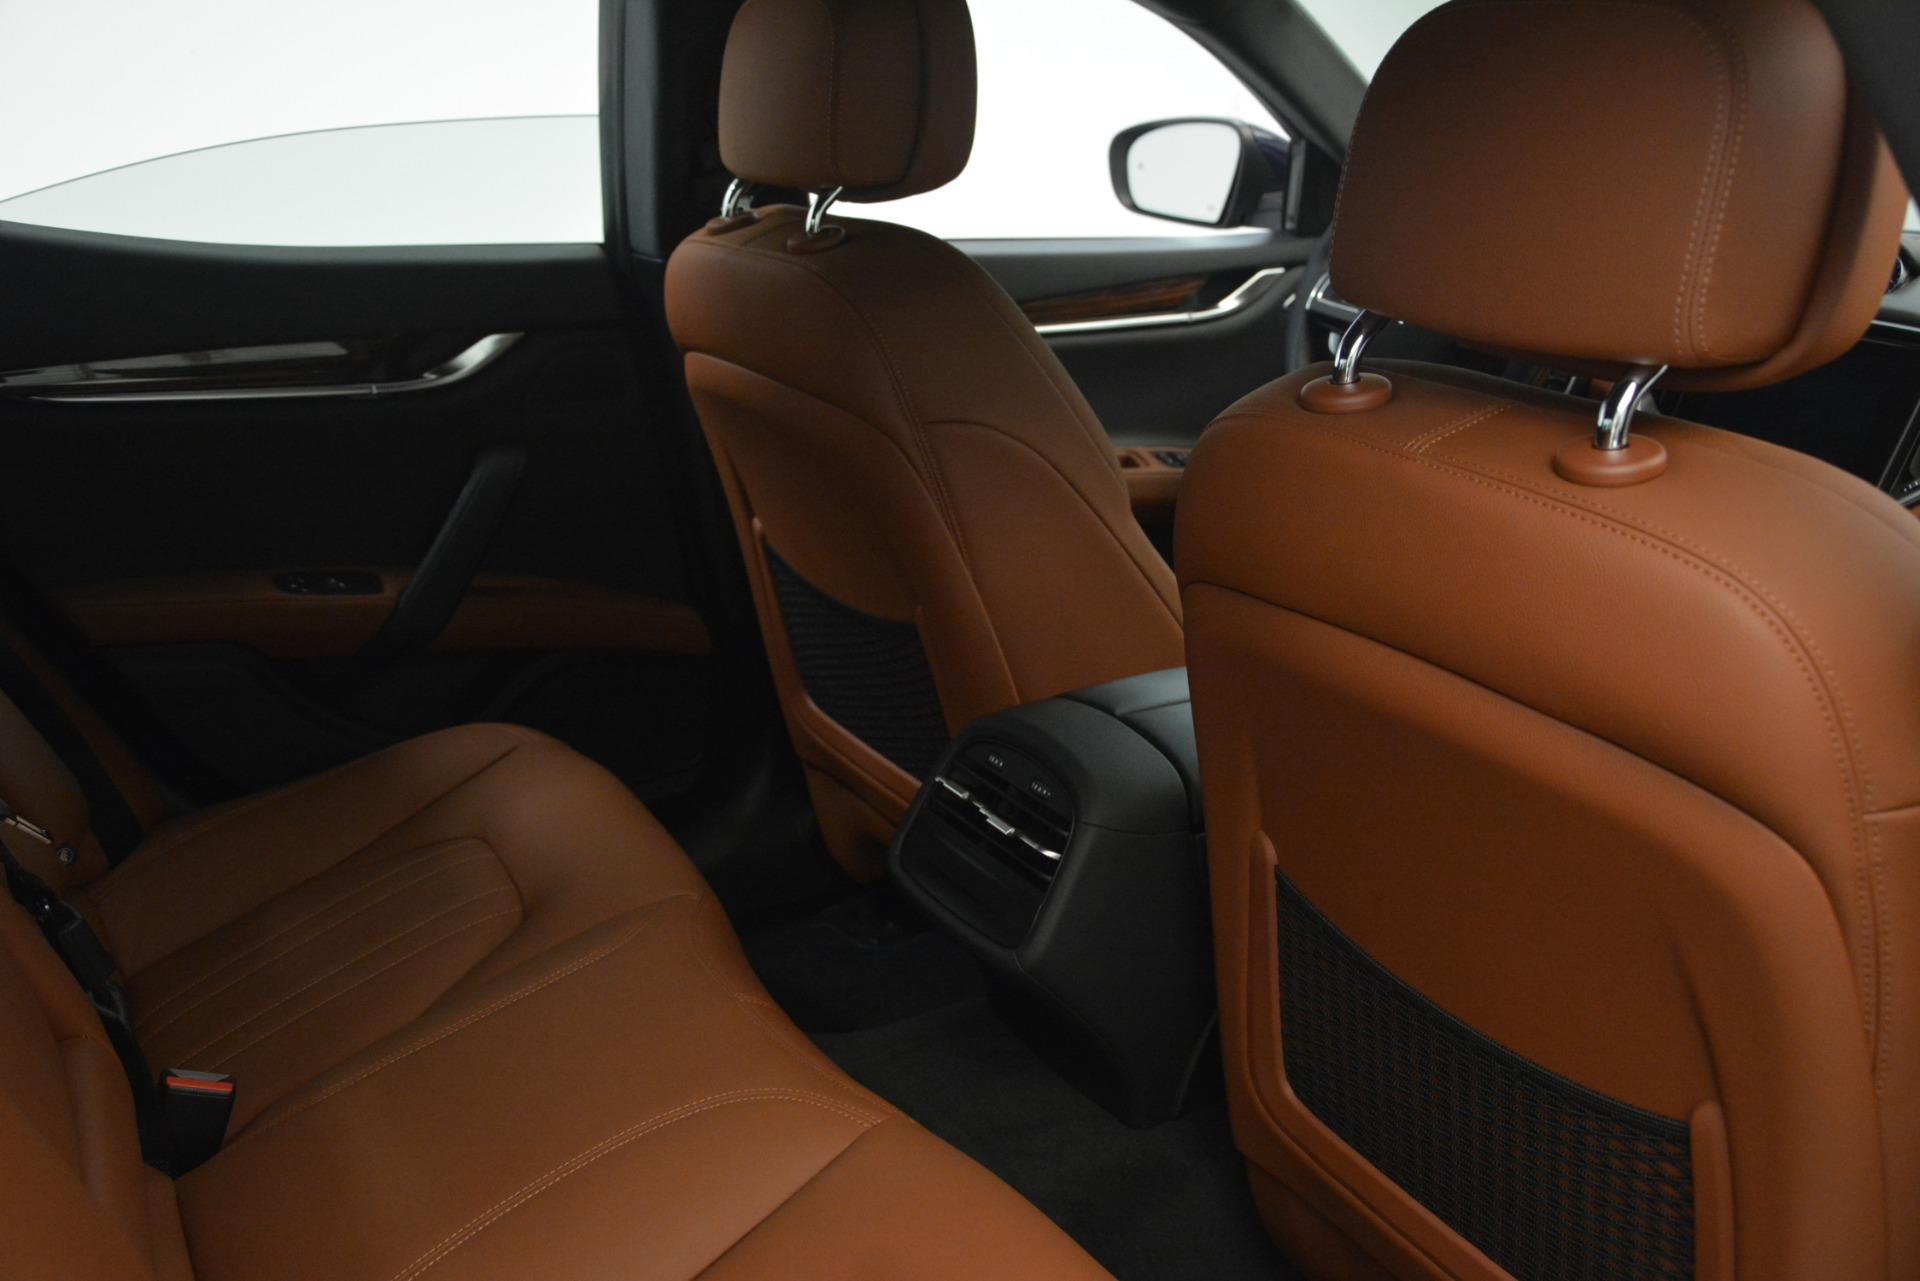 Used 2019 Maserati Ghibli S Q4 For Sale In Greenwich, CT 2585_p23